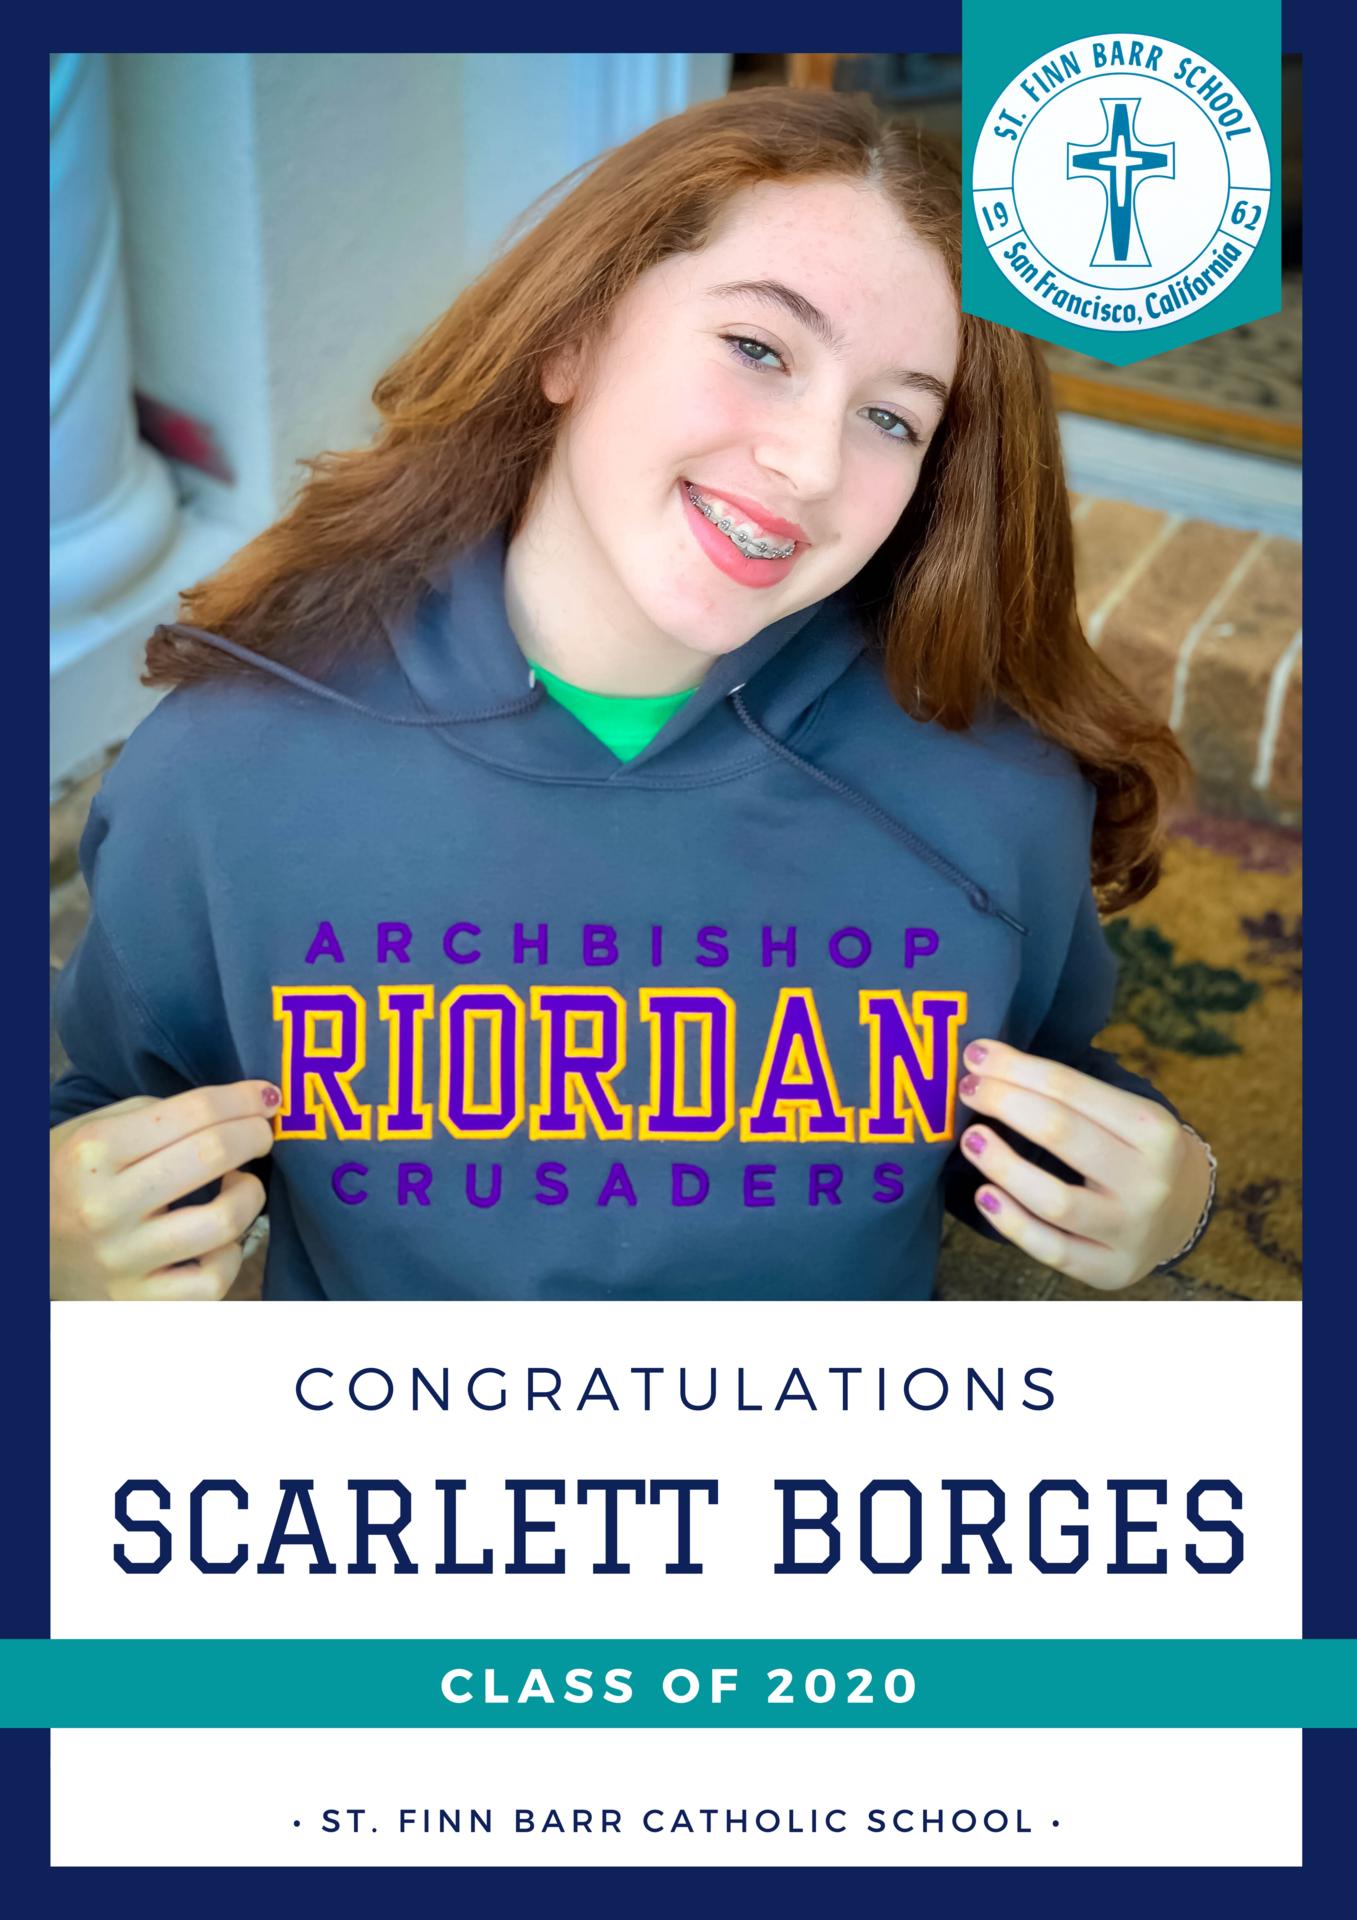 Scarlett Borges